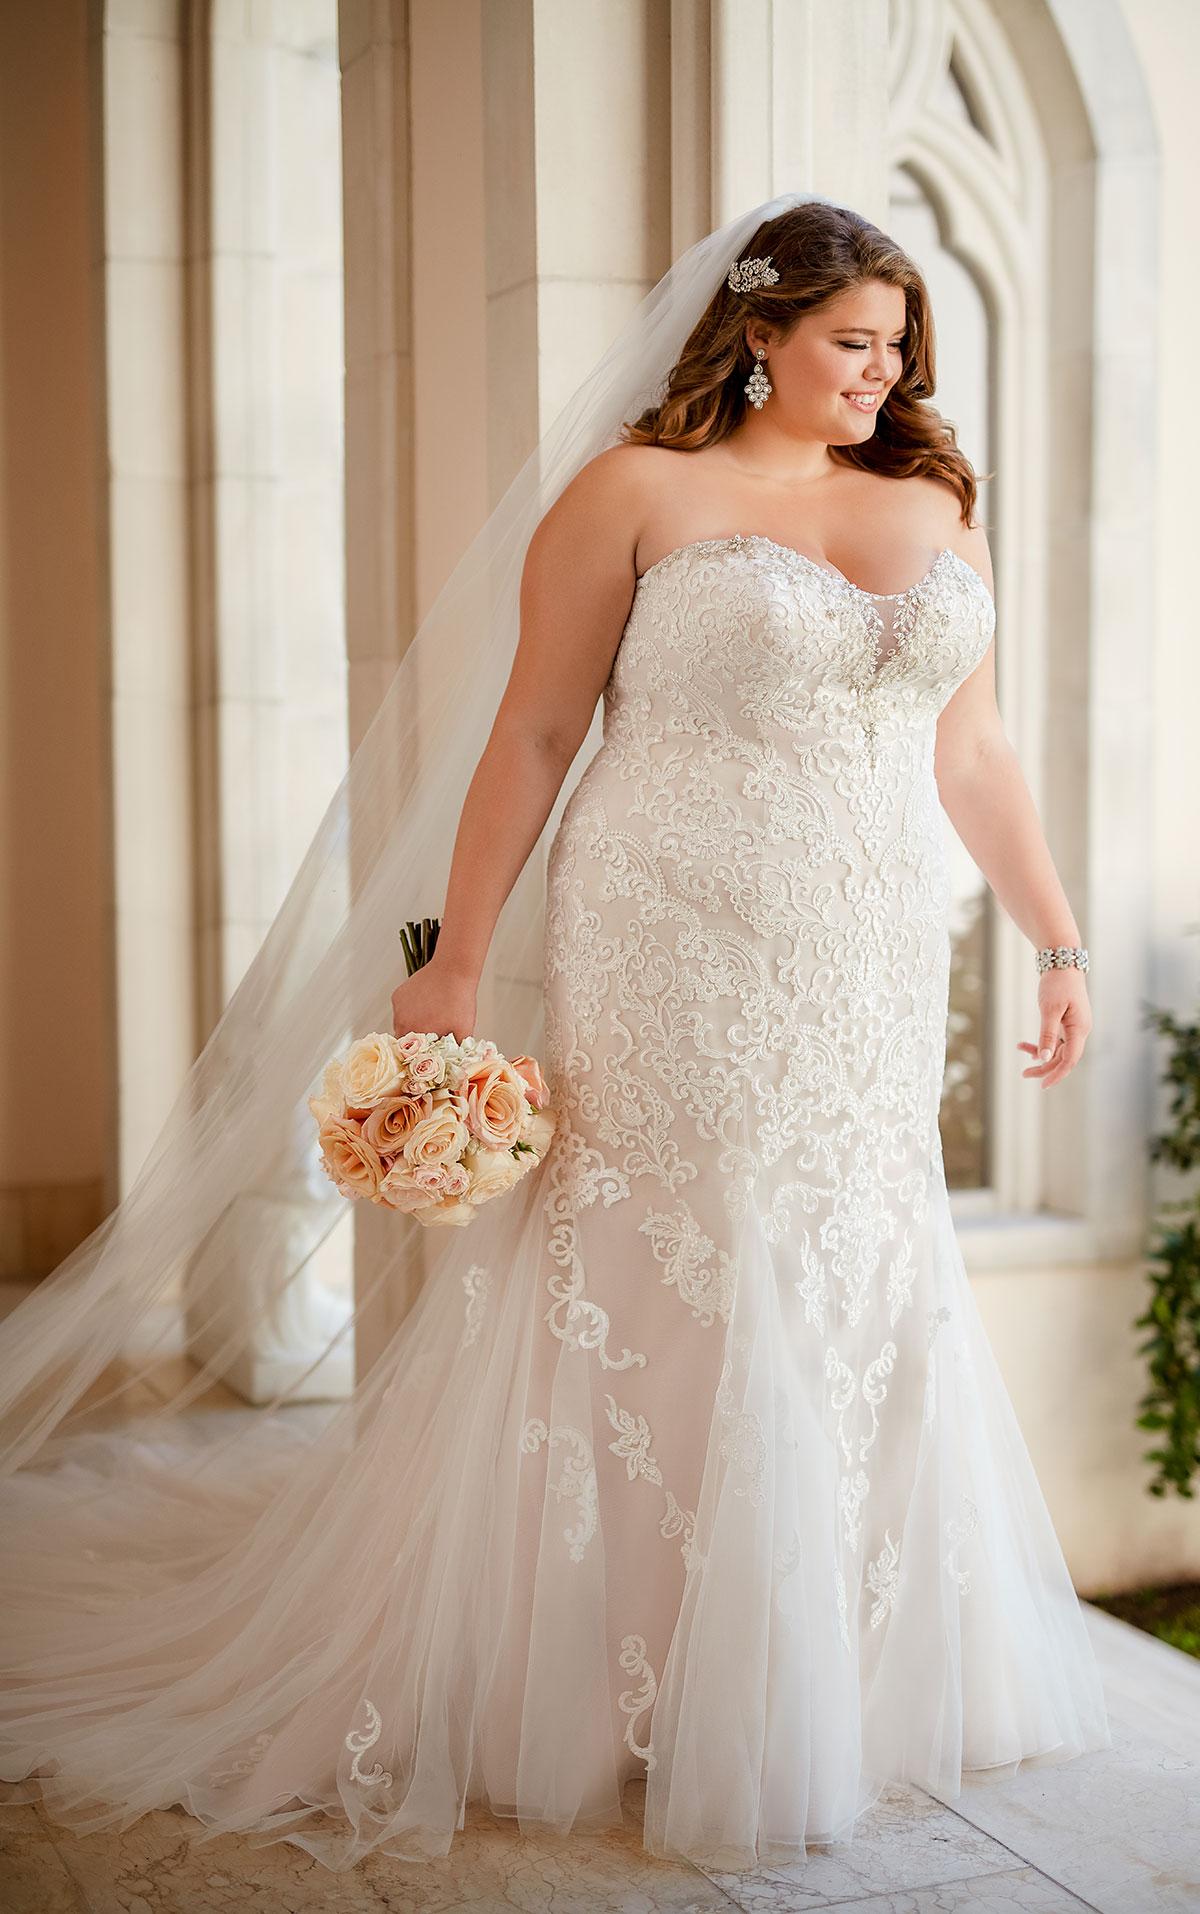 regal wedding dresses photo - 1